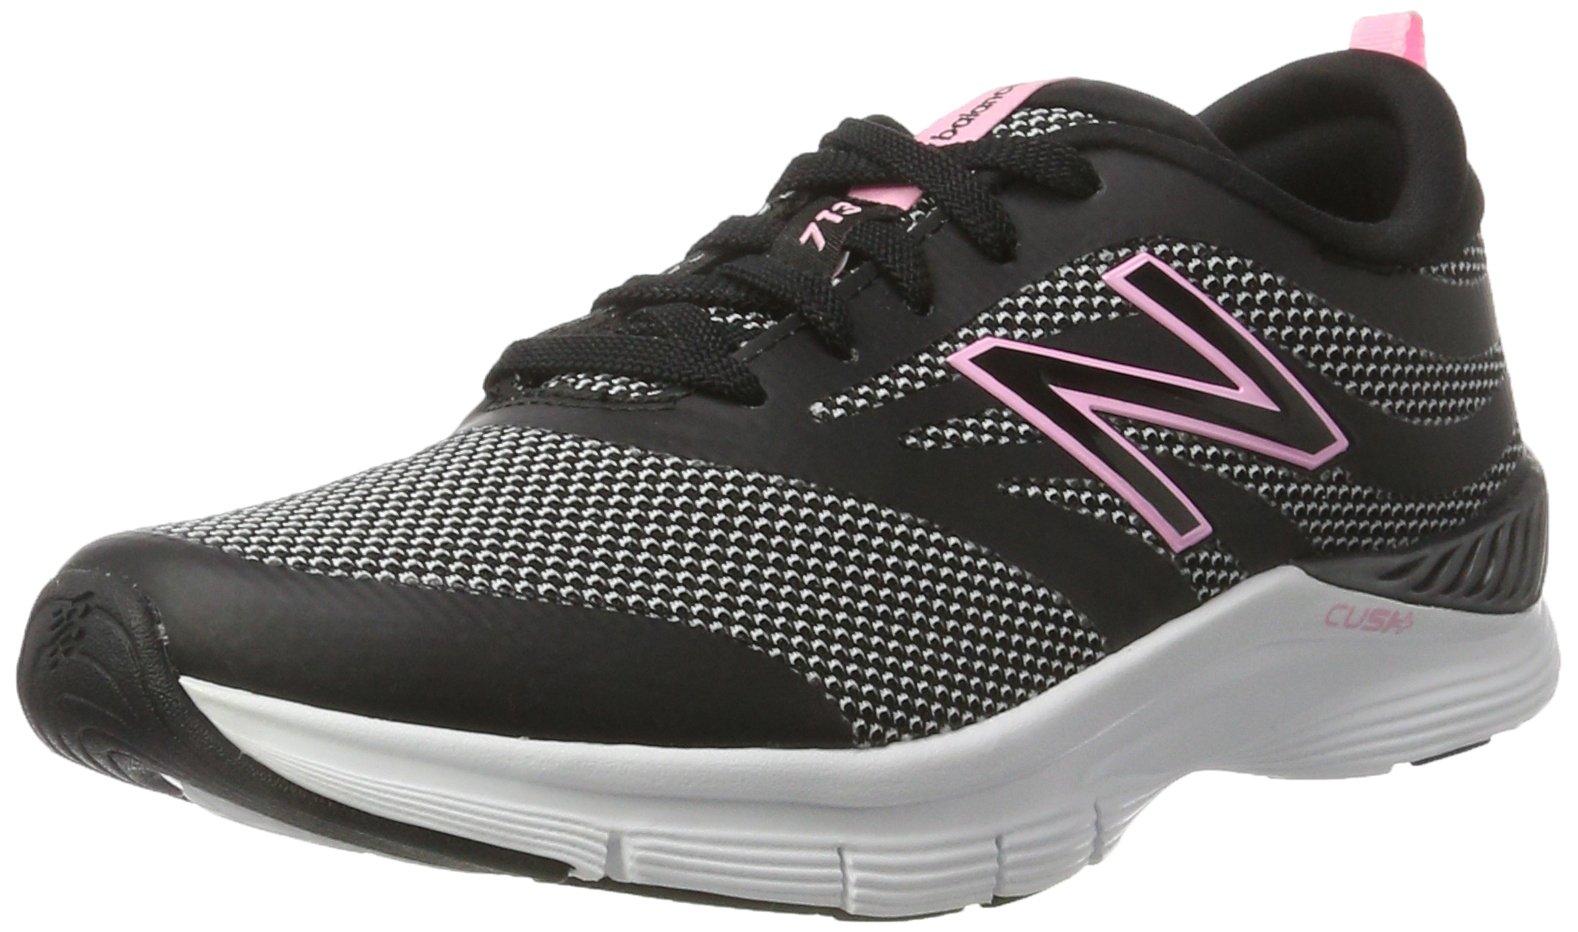 FemmeNoirblack Eu Running 5 pink36 New Wx713hz Chaussures Balance De N80nmw